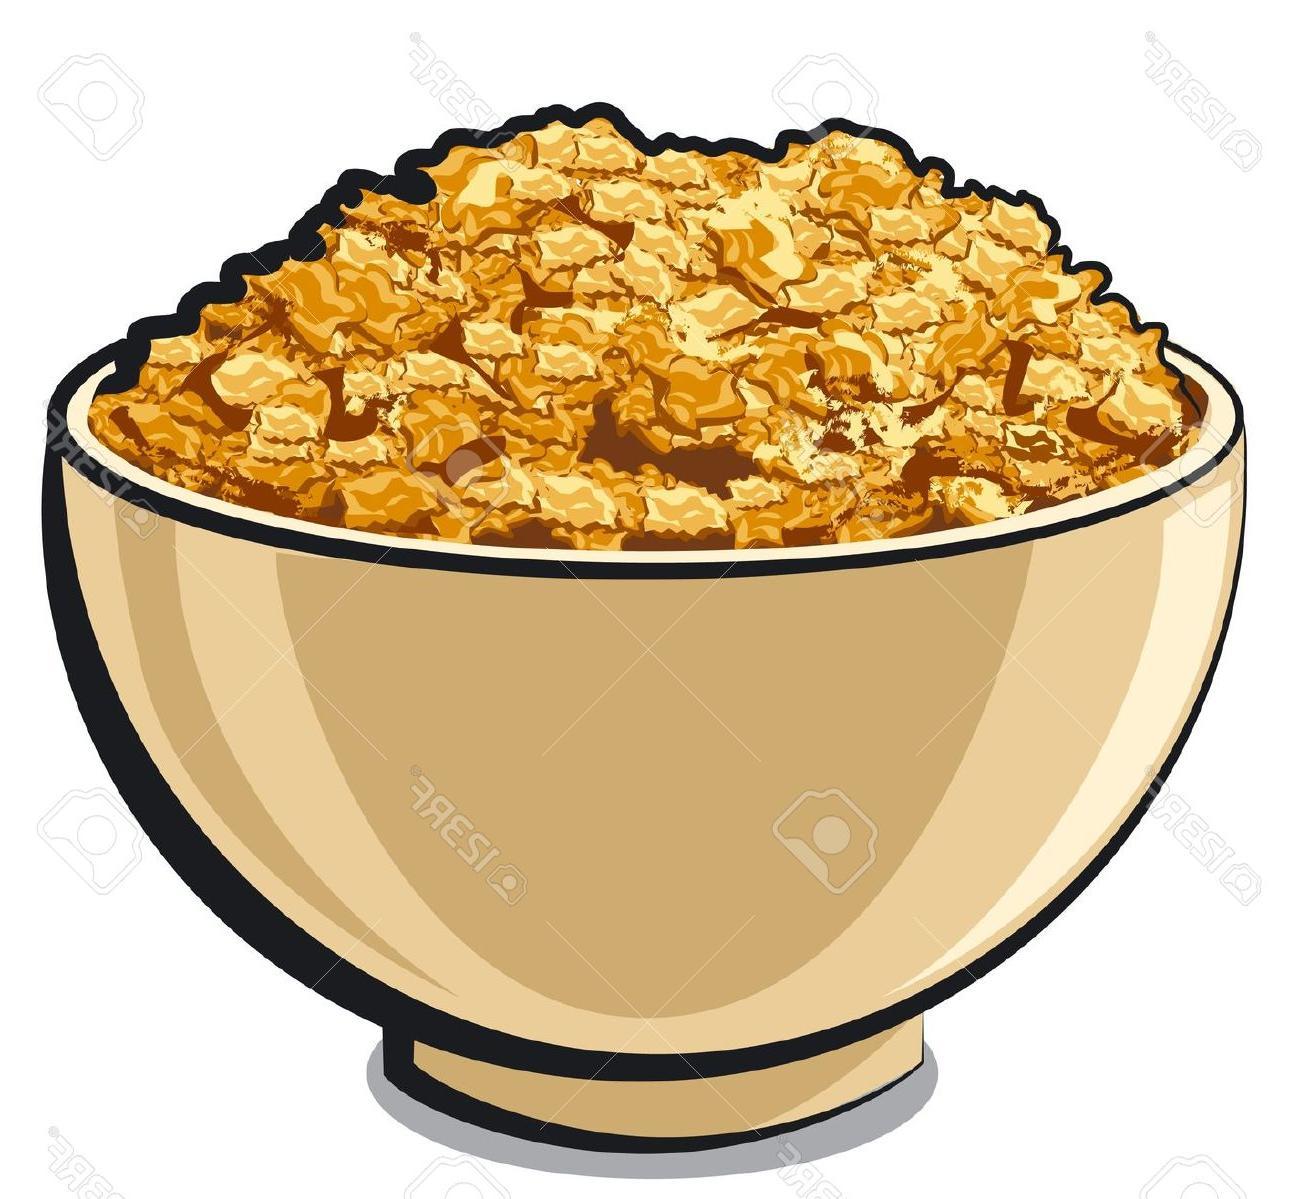 Cereal clipart bowl cereal. Unique clip art cdr